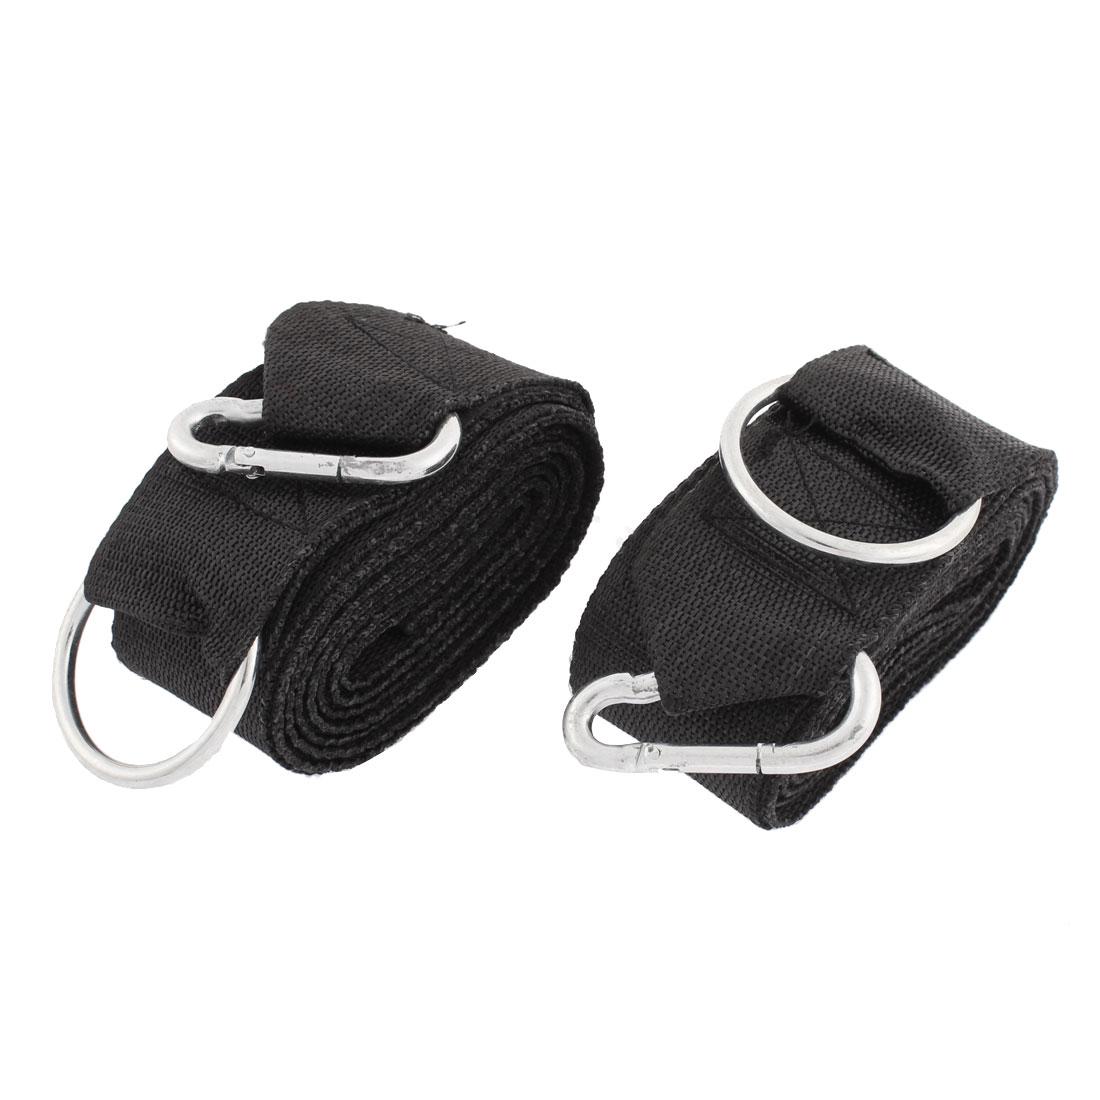 2 Pcs Metal Ring Carabiner Hook 5cm Width 300cm Long Black Nylon Hanging Hammock Strap Safety Belt Band